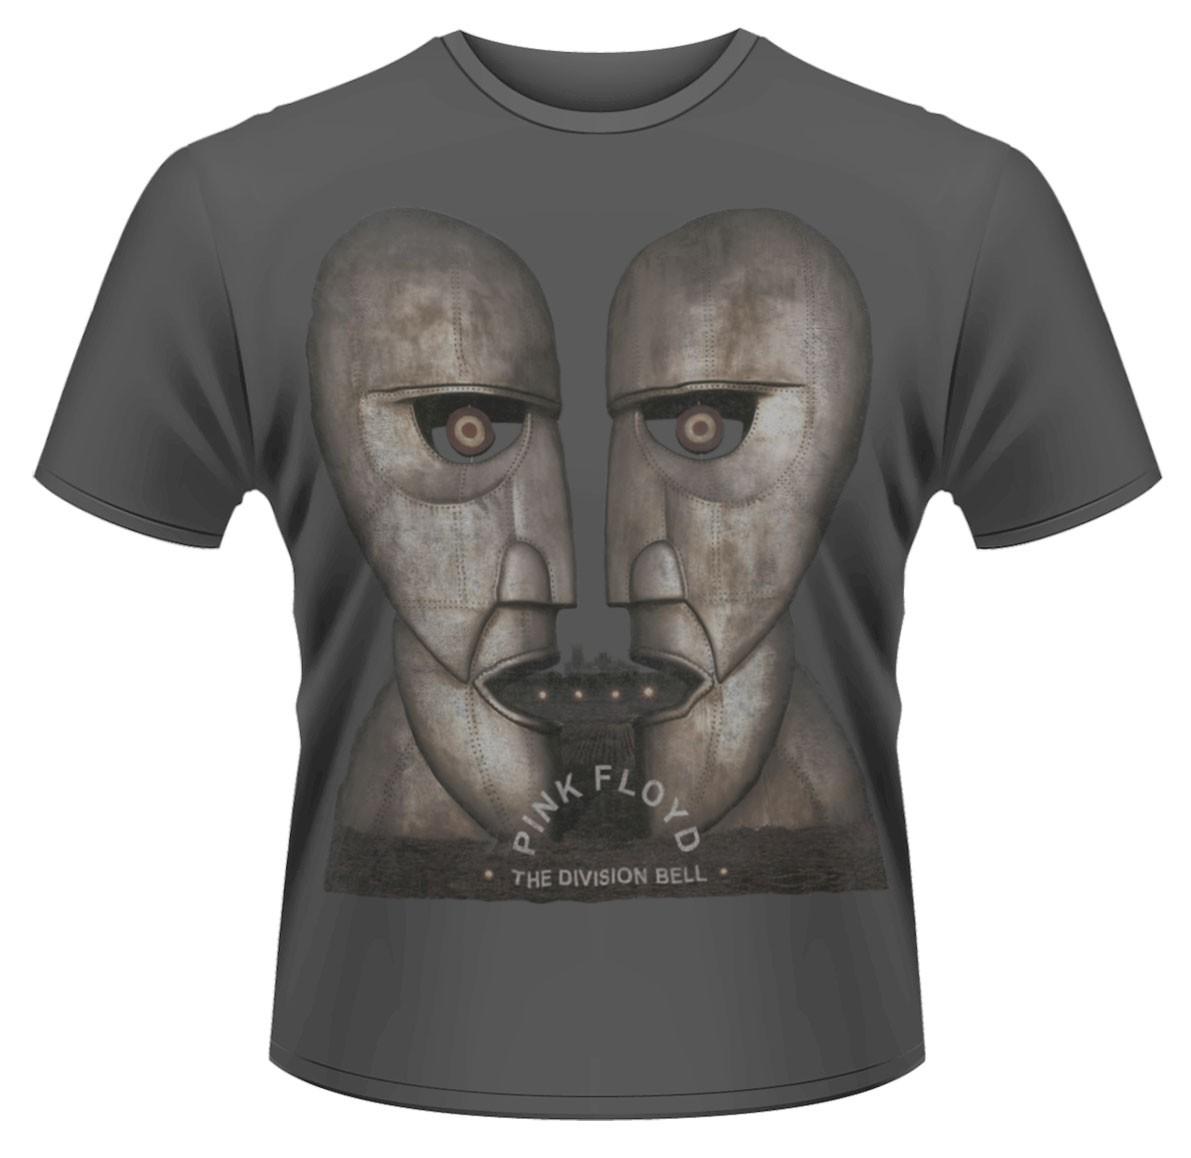 Division Shirt Division Bell' T-shirt